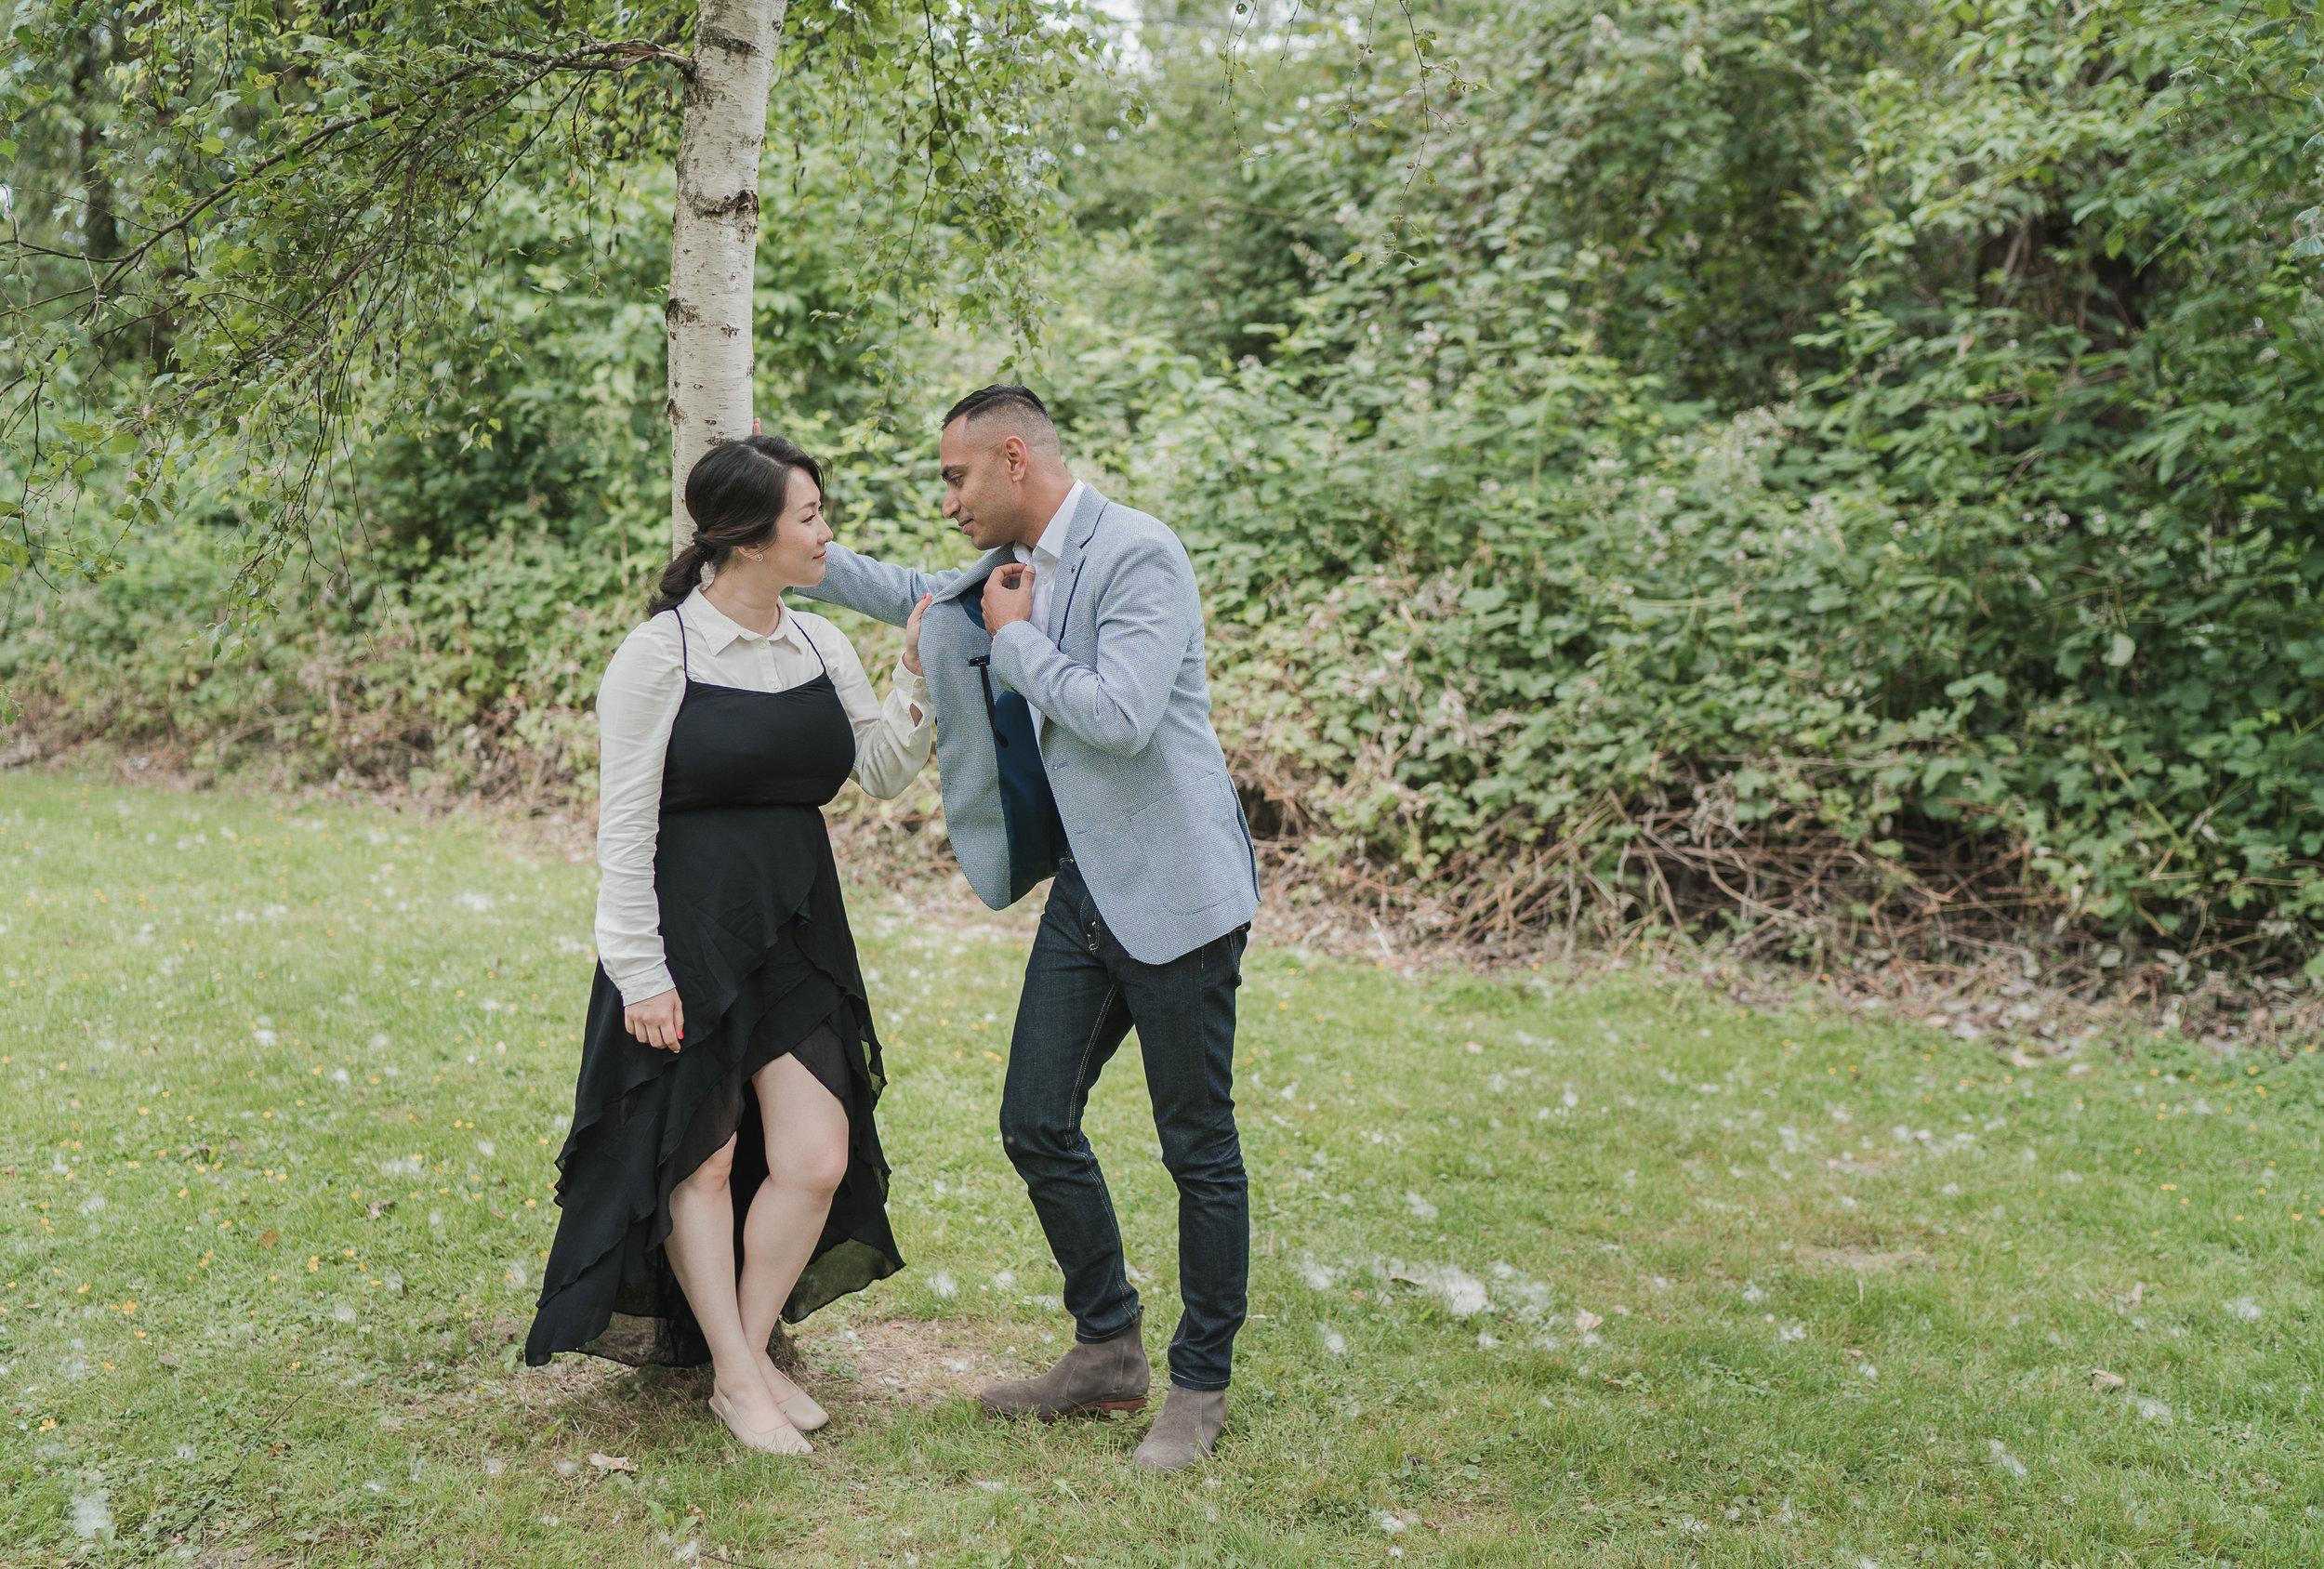 20190622 - Monika & Johnson Engagement- 0051.jpg